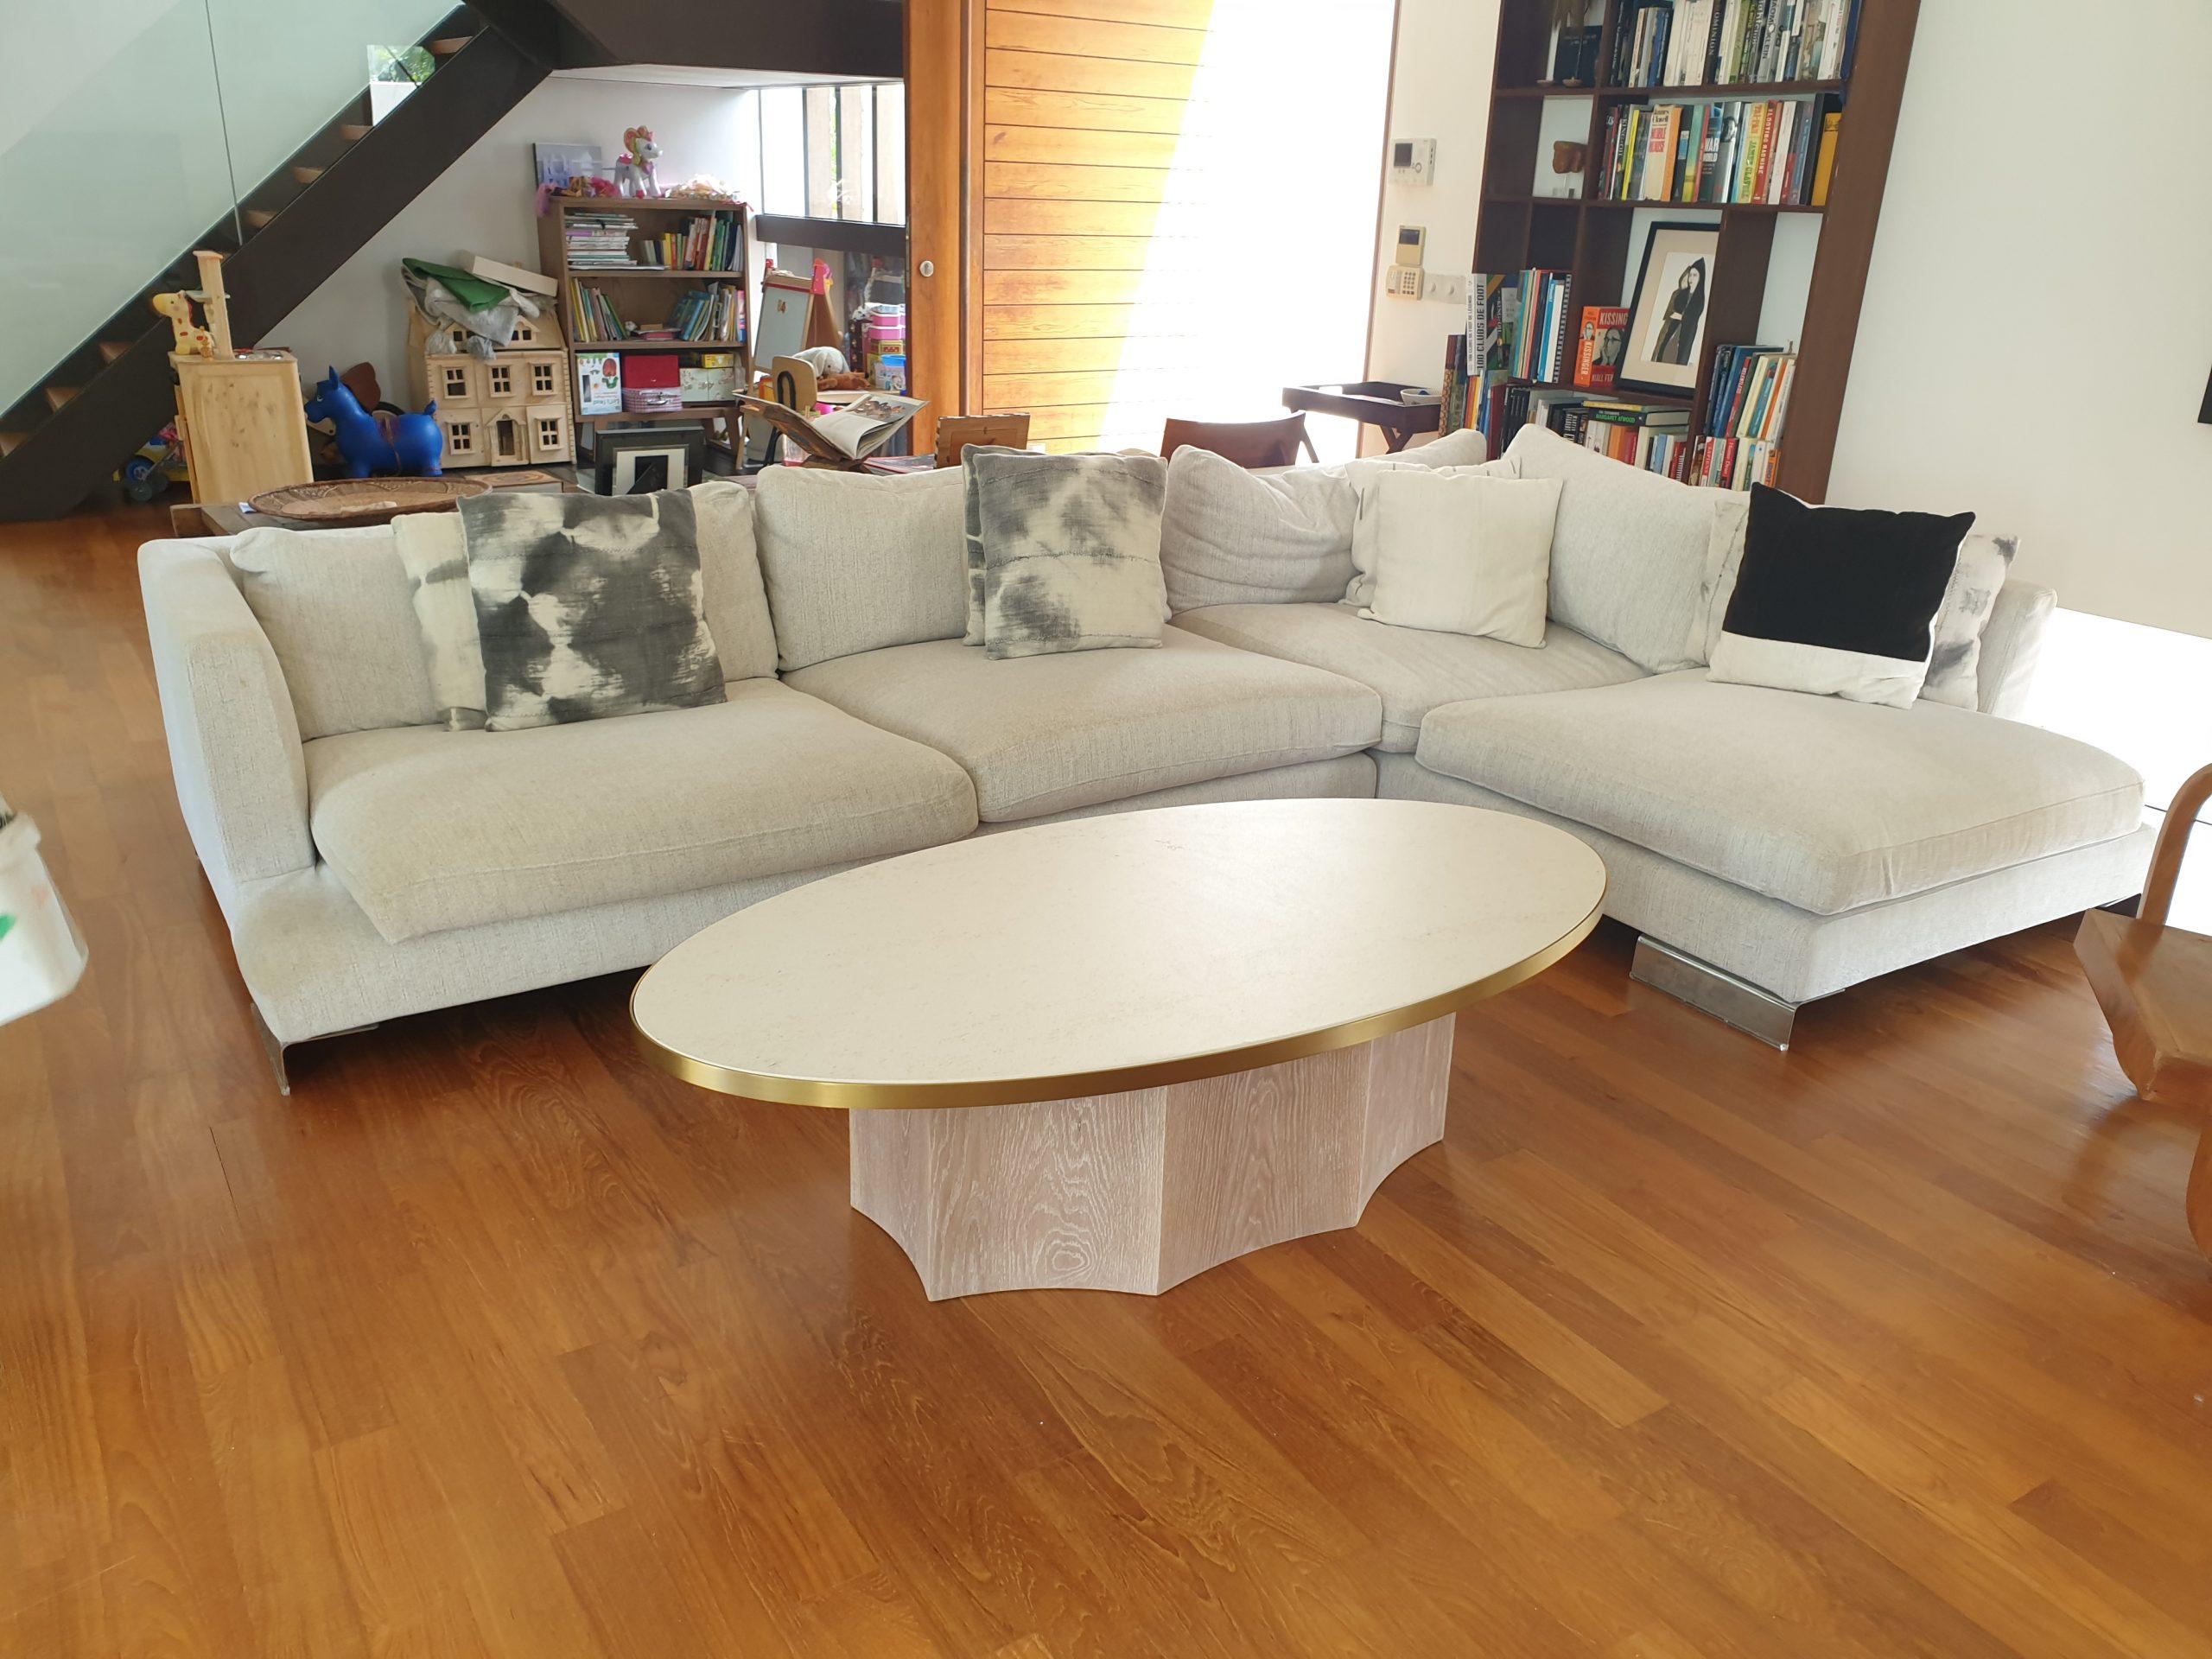 Ocho Coffee Table 1450L x 750W x 400H, Dekton, Danae, Oak, White wash, SS, Gold